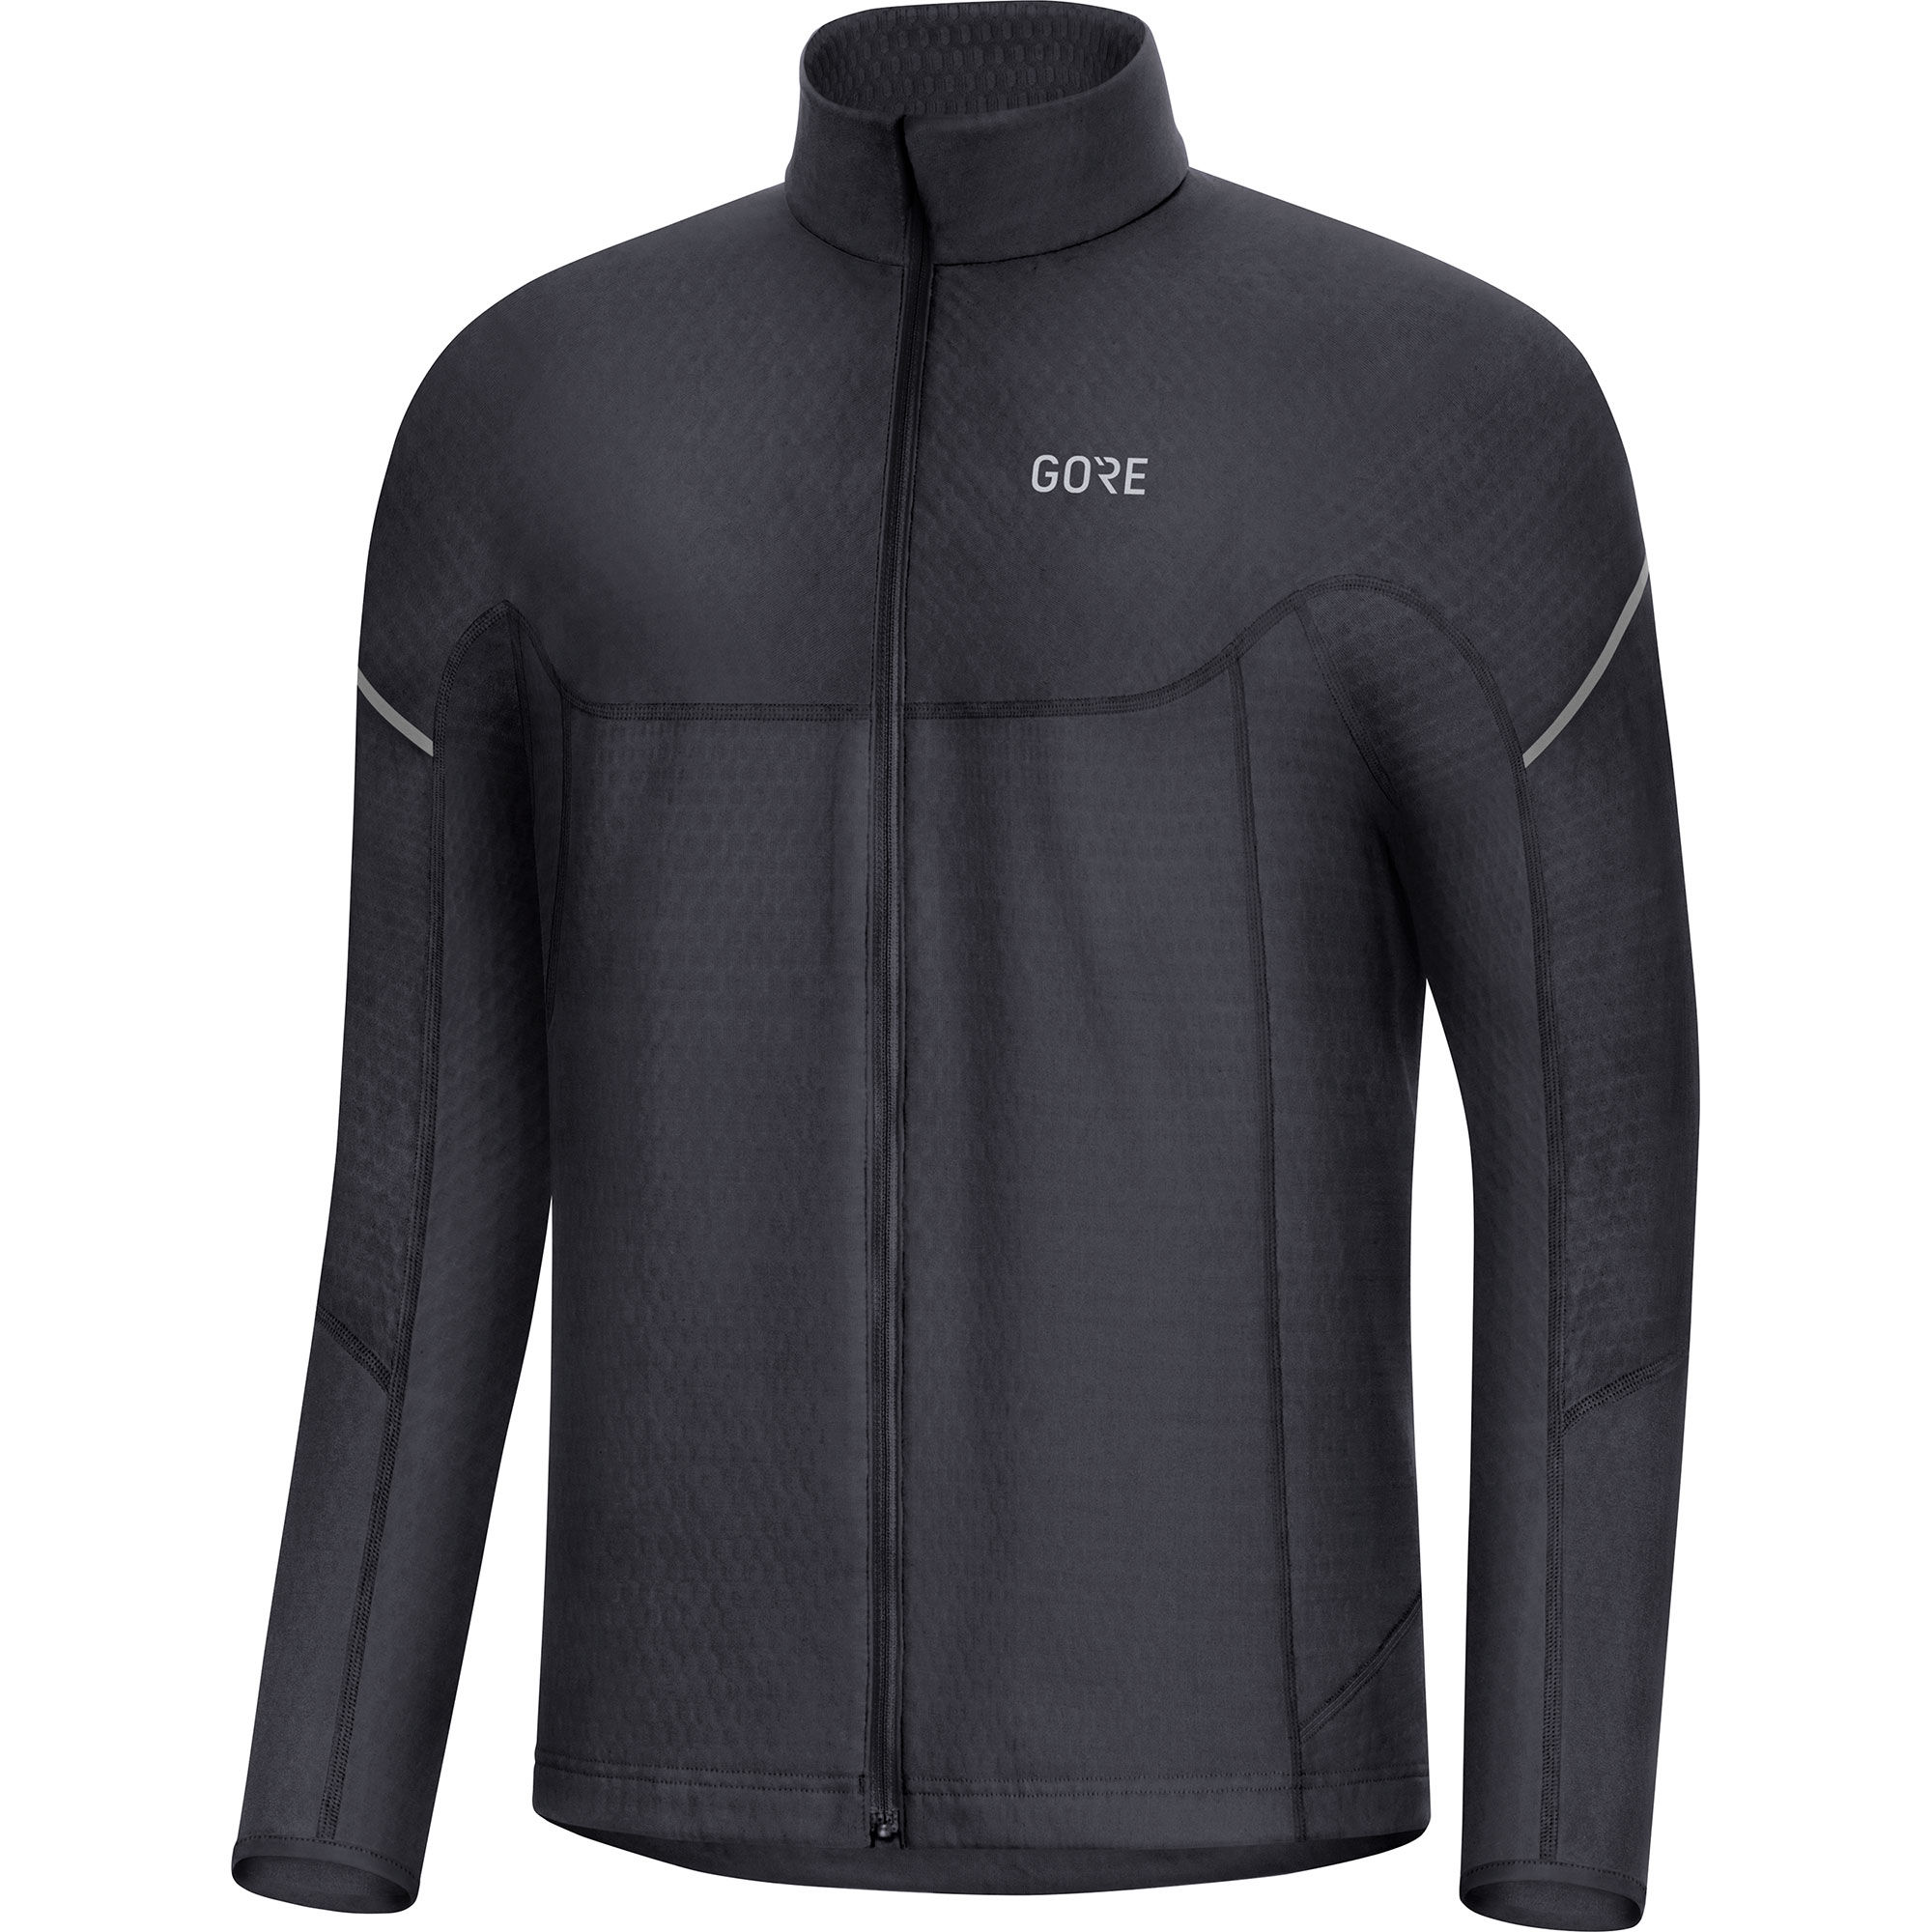 Gore Thermo Zip Shirt Langarm in Schwarz